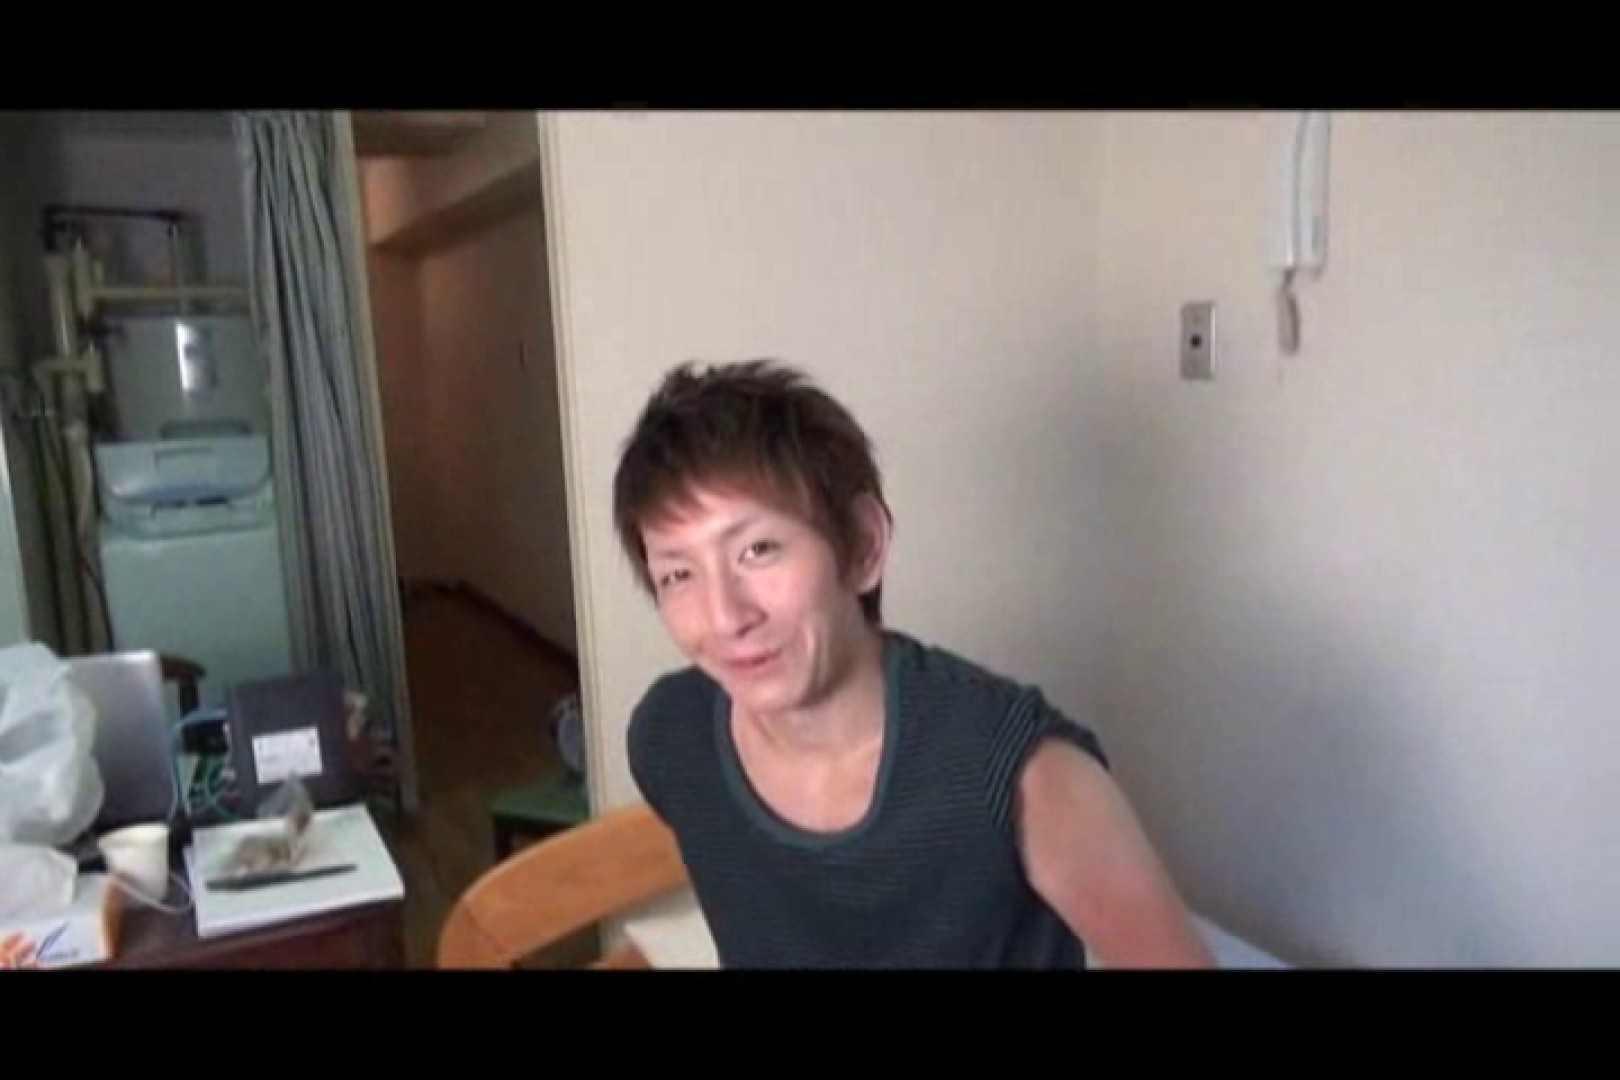 ONA見せカーニバル!! Vol2 イケメン・パラダイス ゲイ精子画像 98画像 35